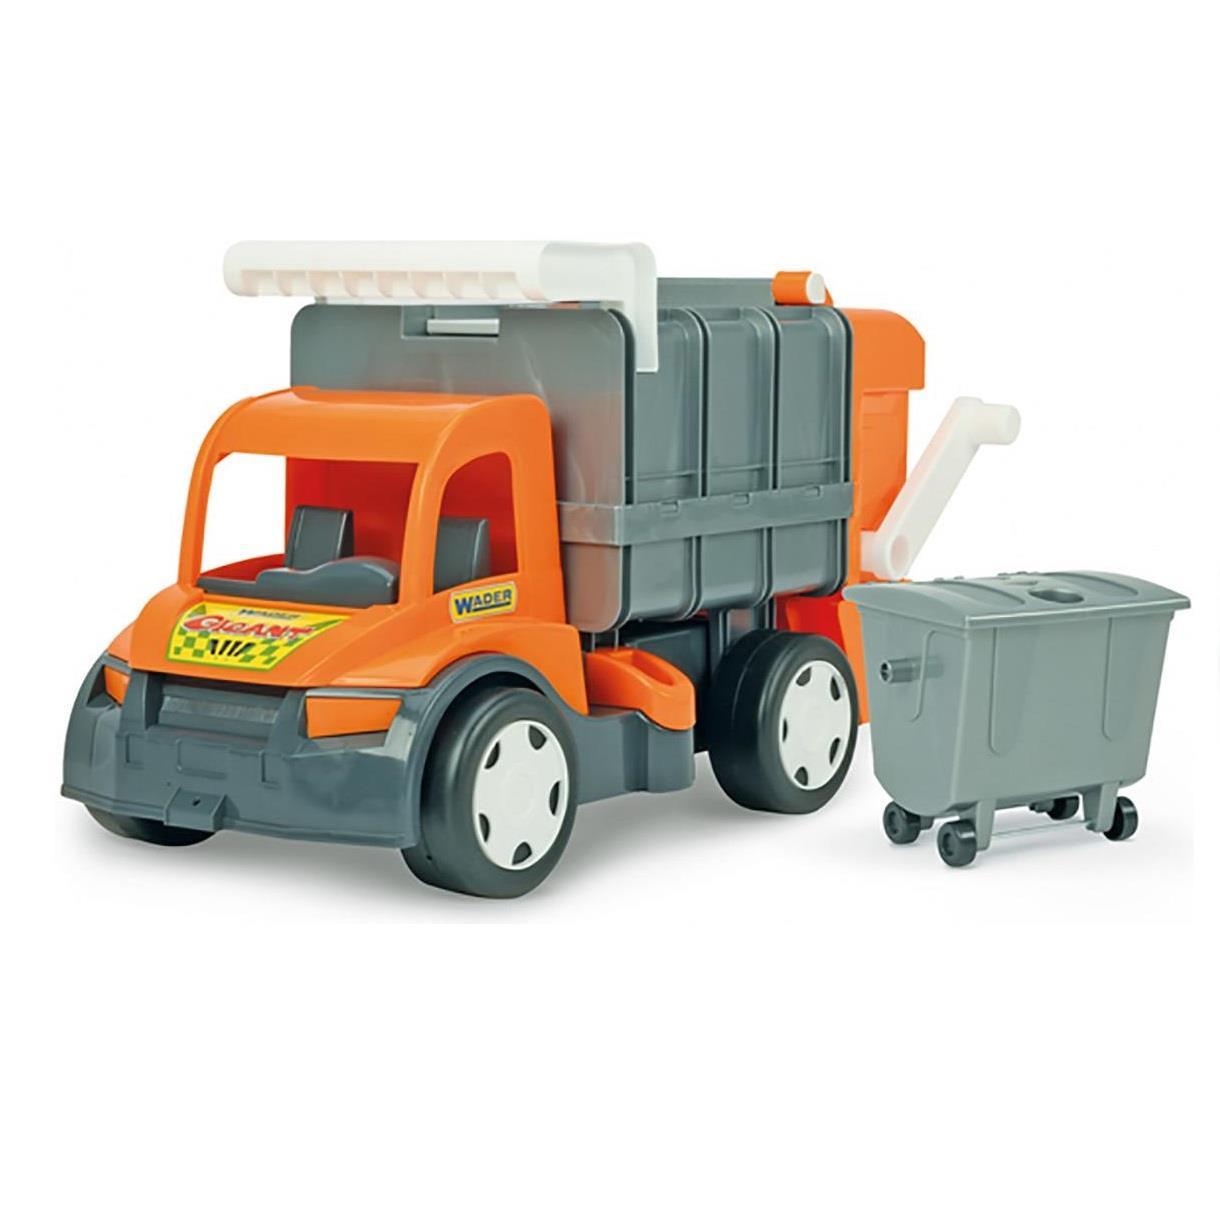 Seria Gigant Śmieciarka Orange/Blue, Farmer Wader